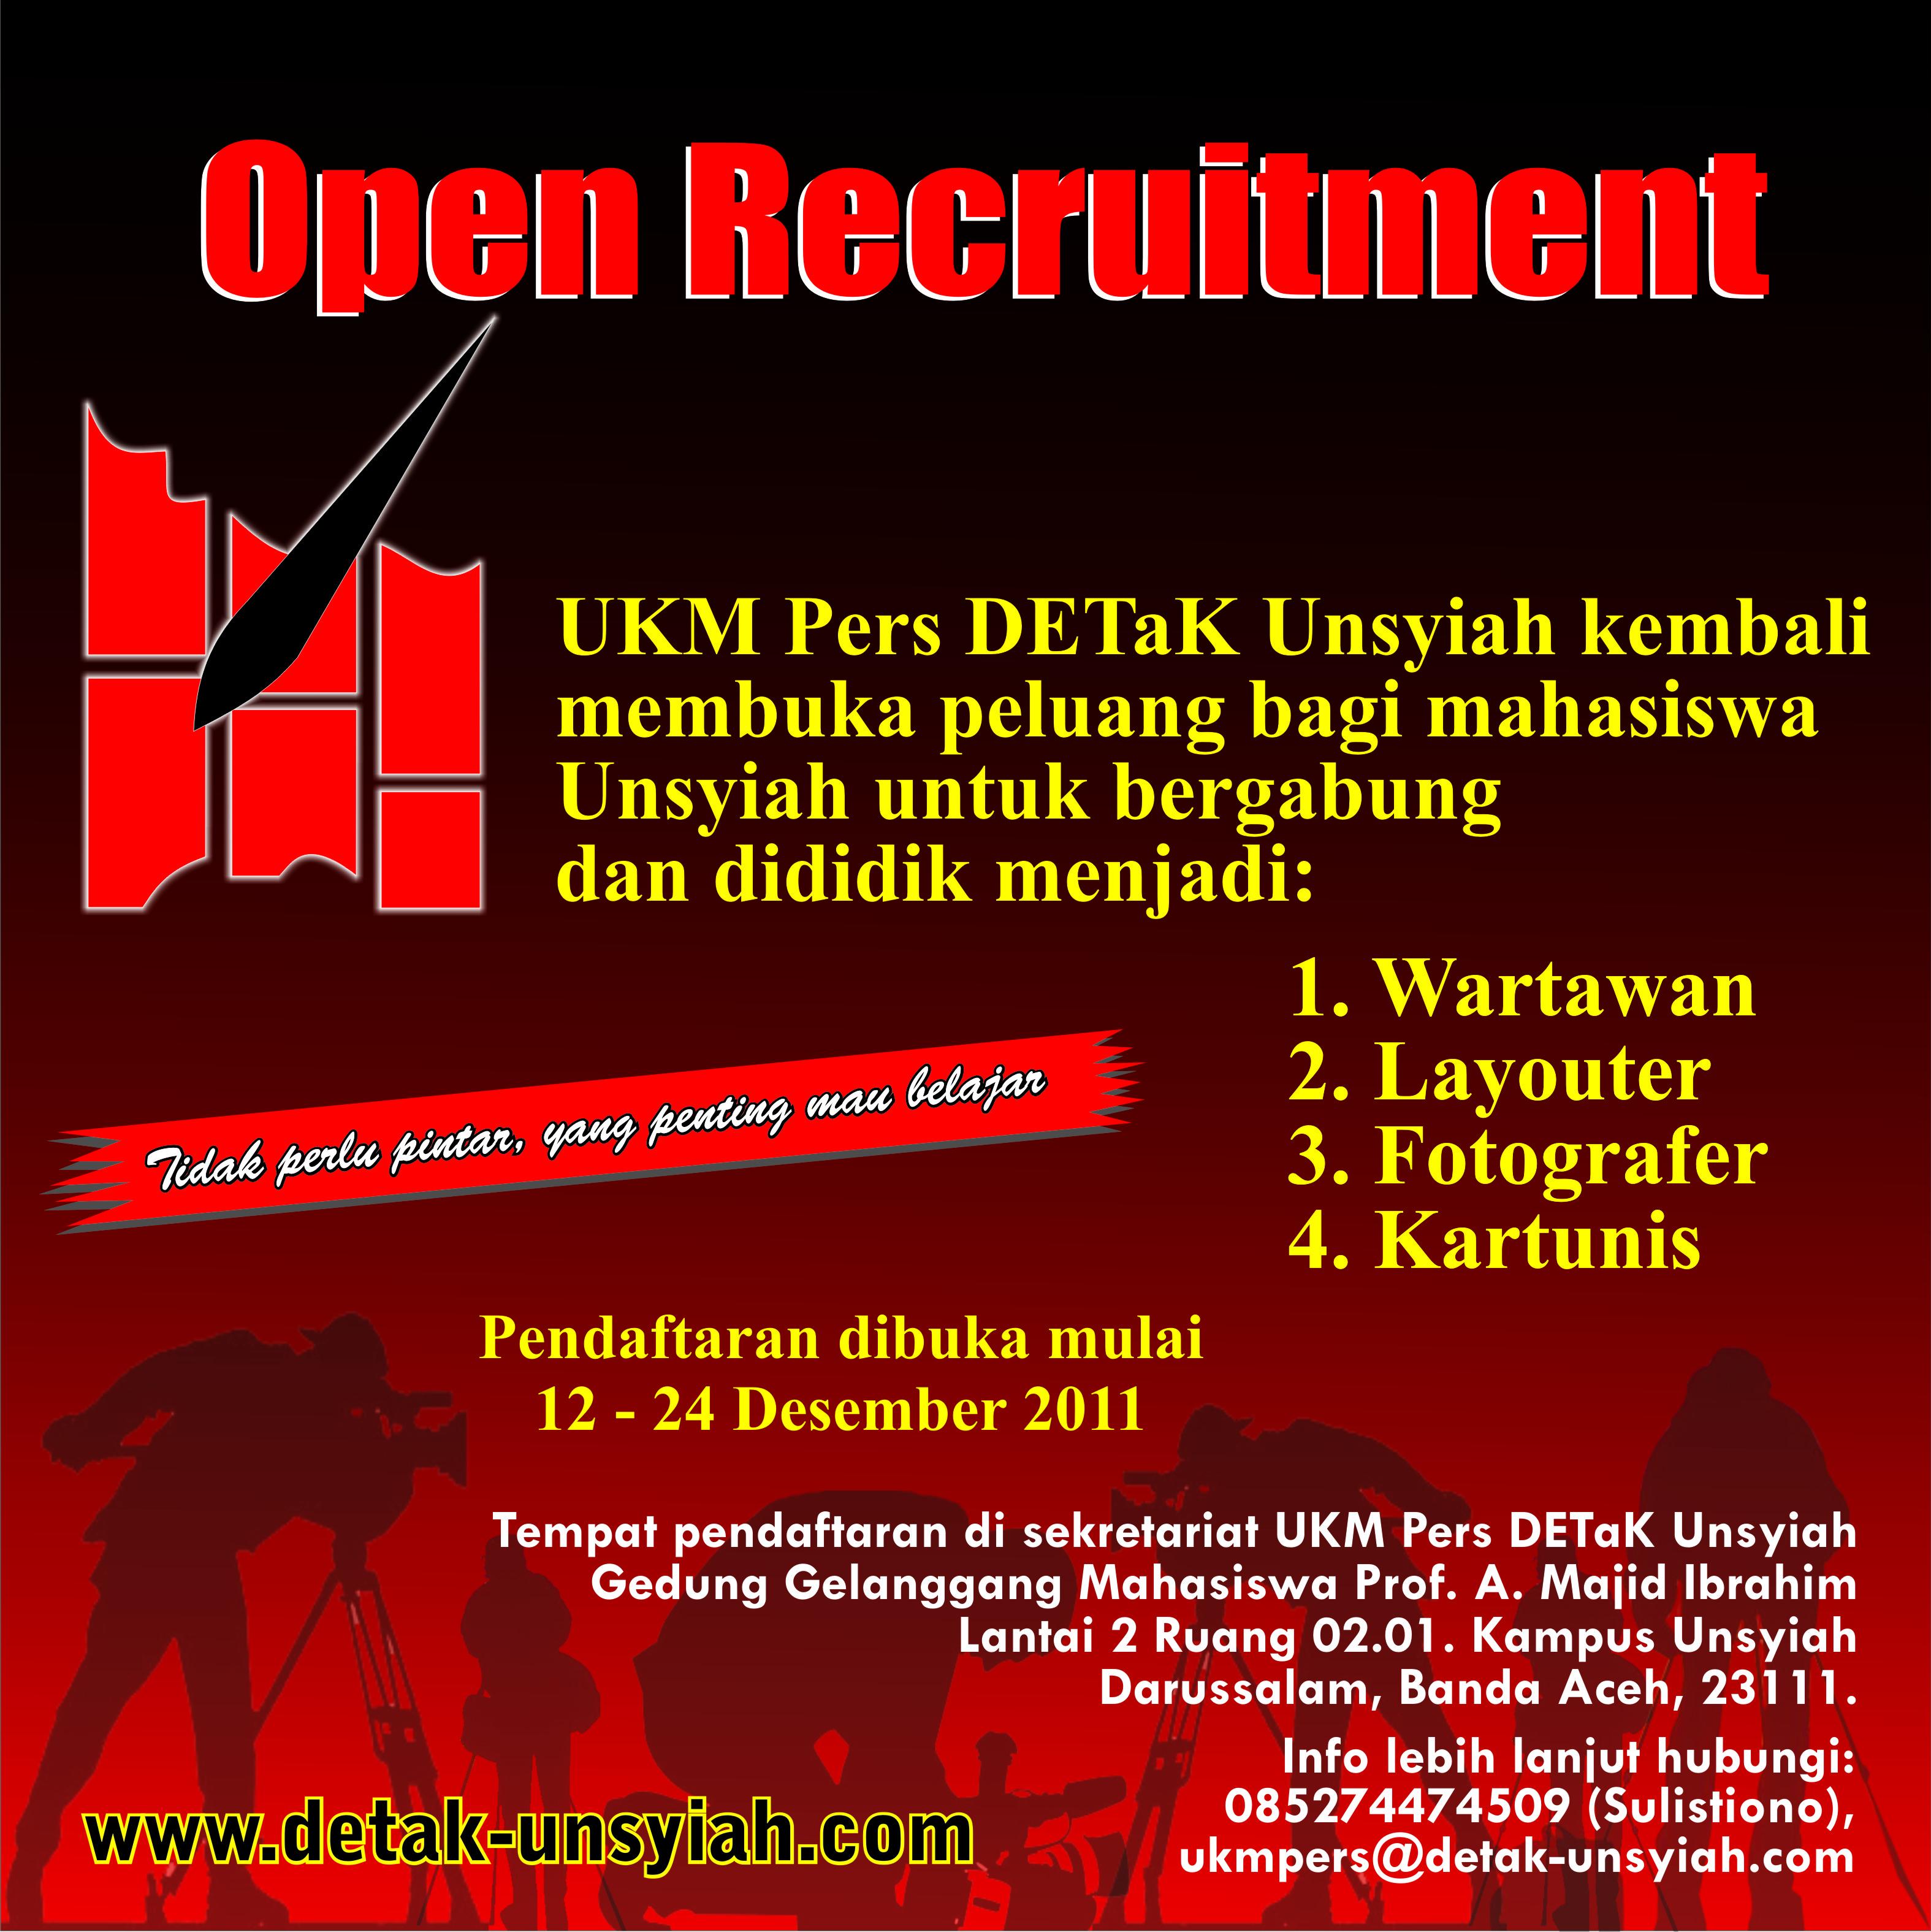 Contoh Spanduk: UKM Pers DETaK Unsyiah Open Recruitment [OR]